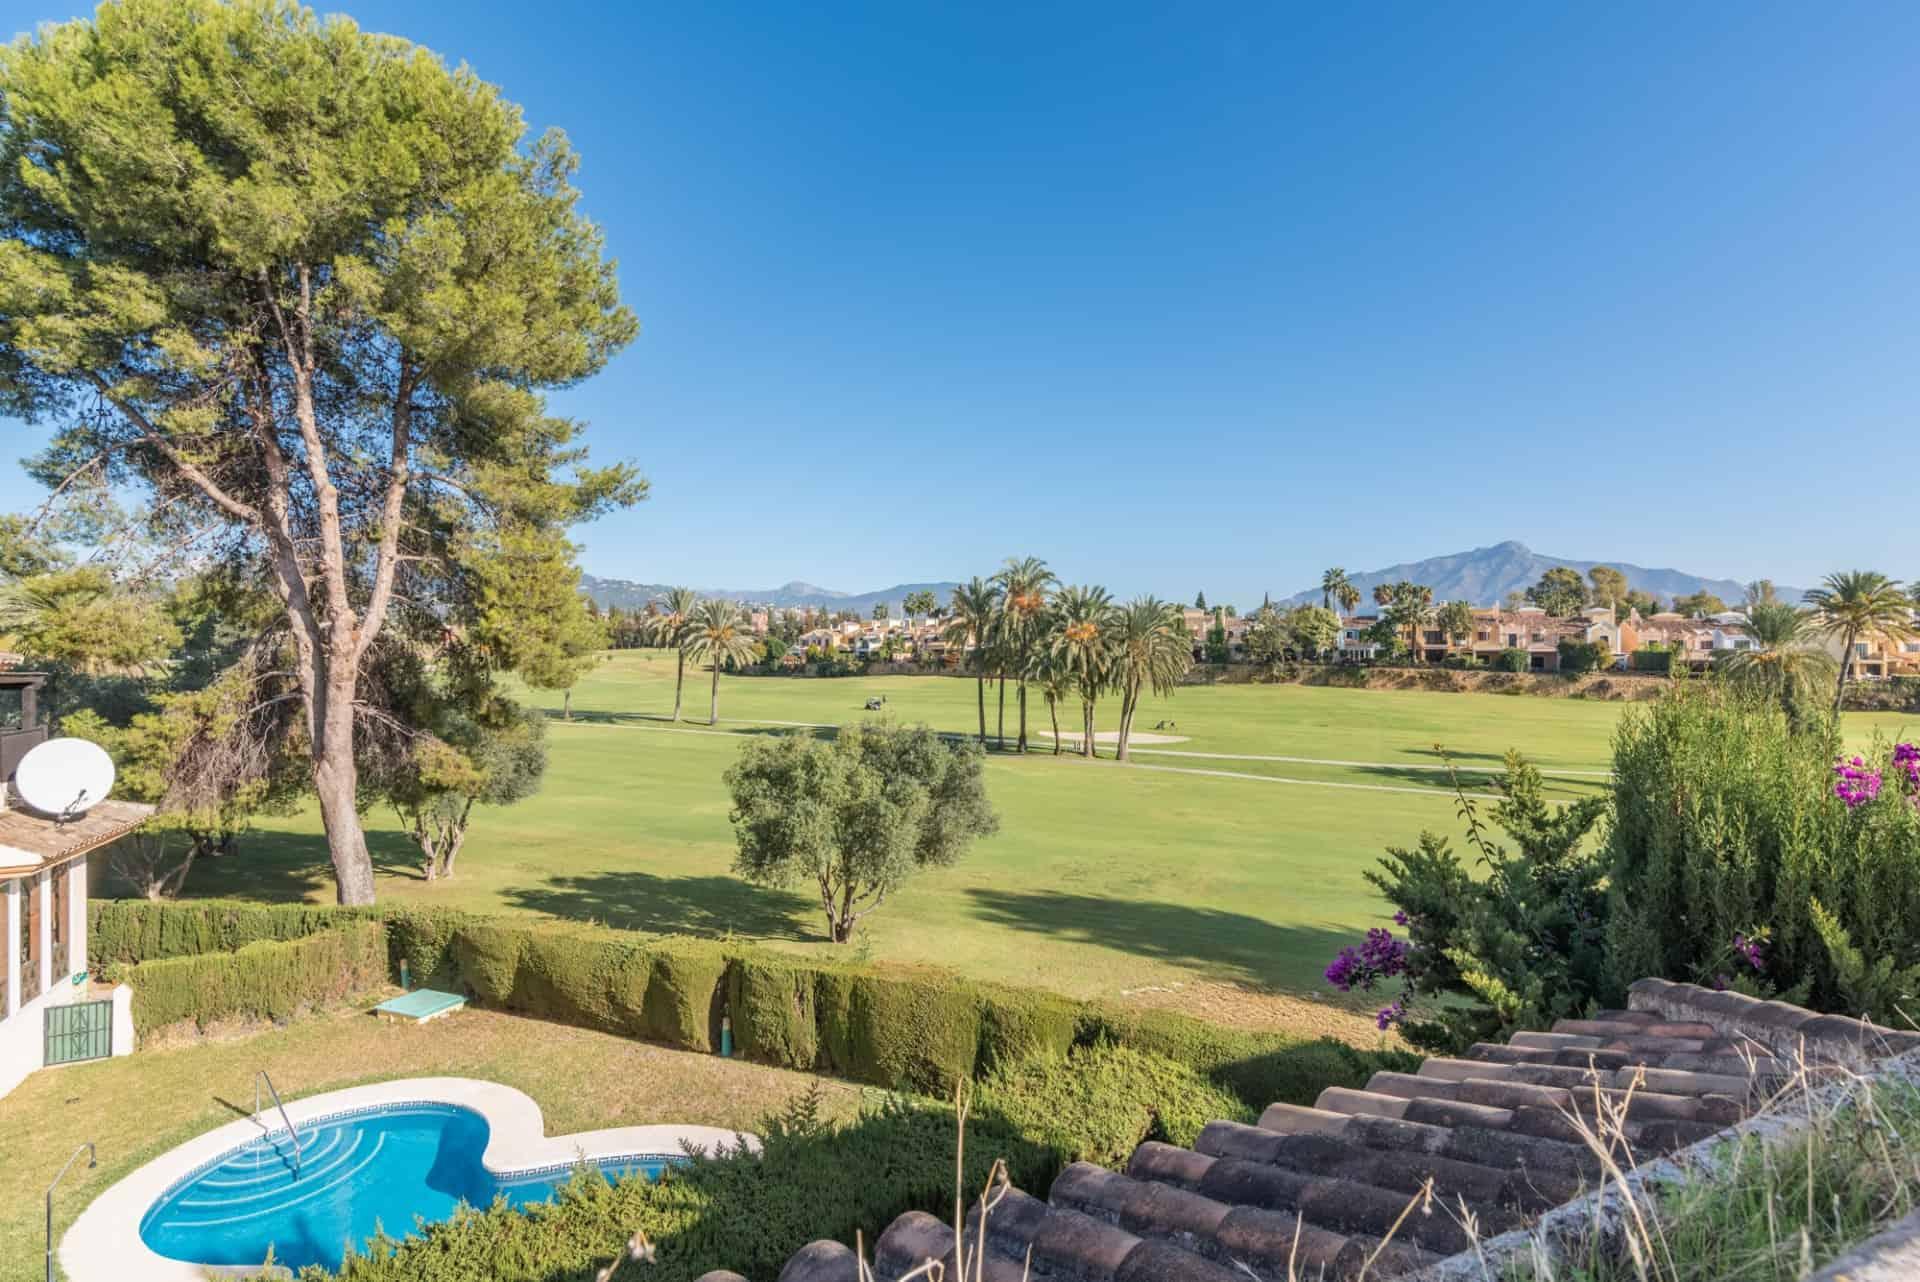 Guadalmina, the home of golf in Marbella